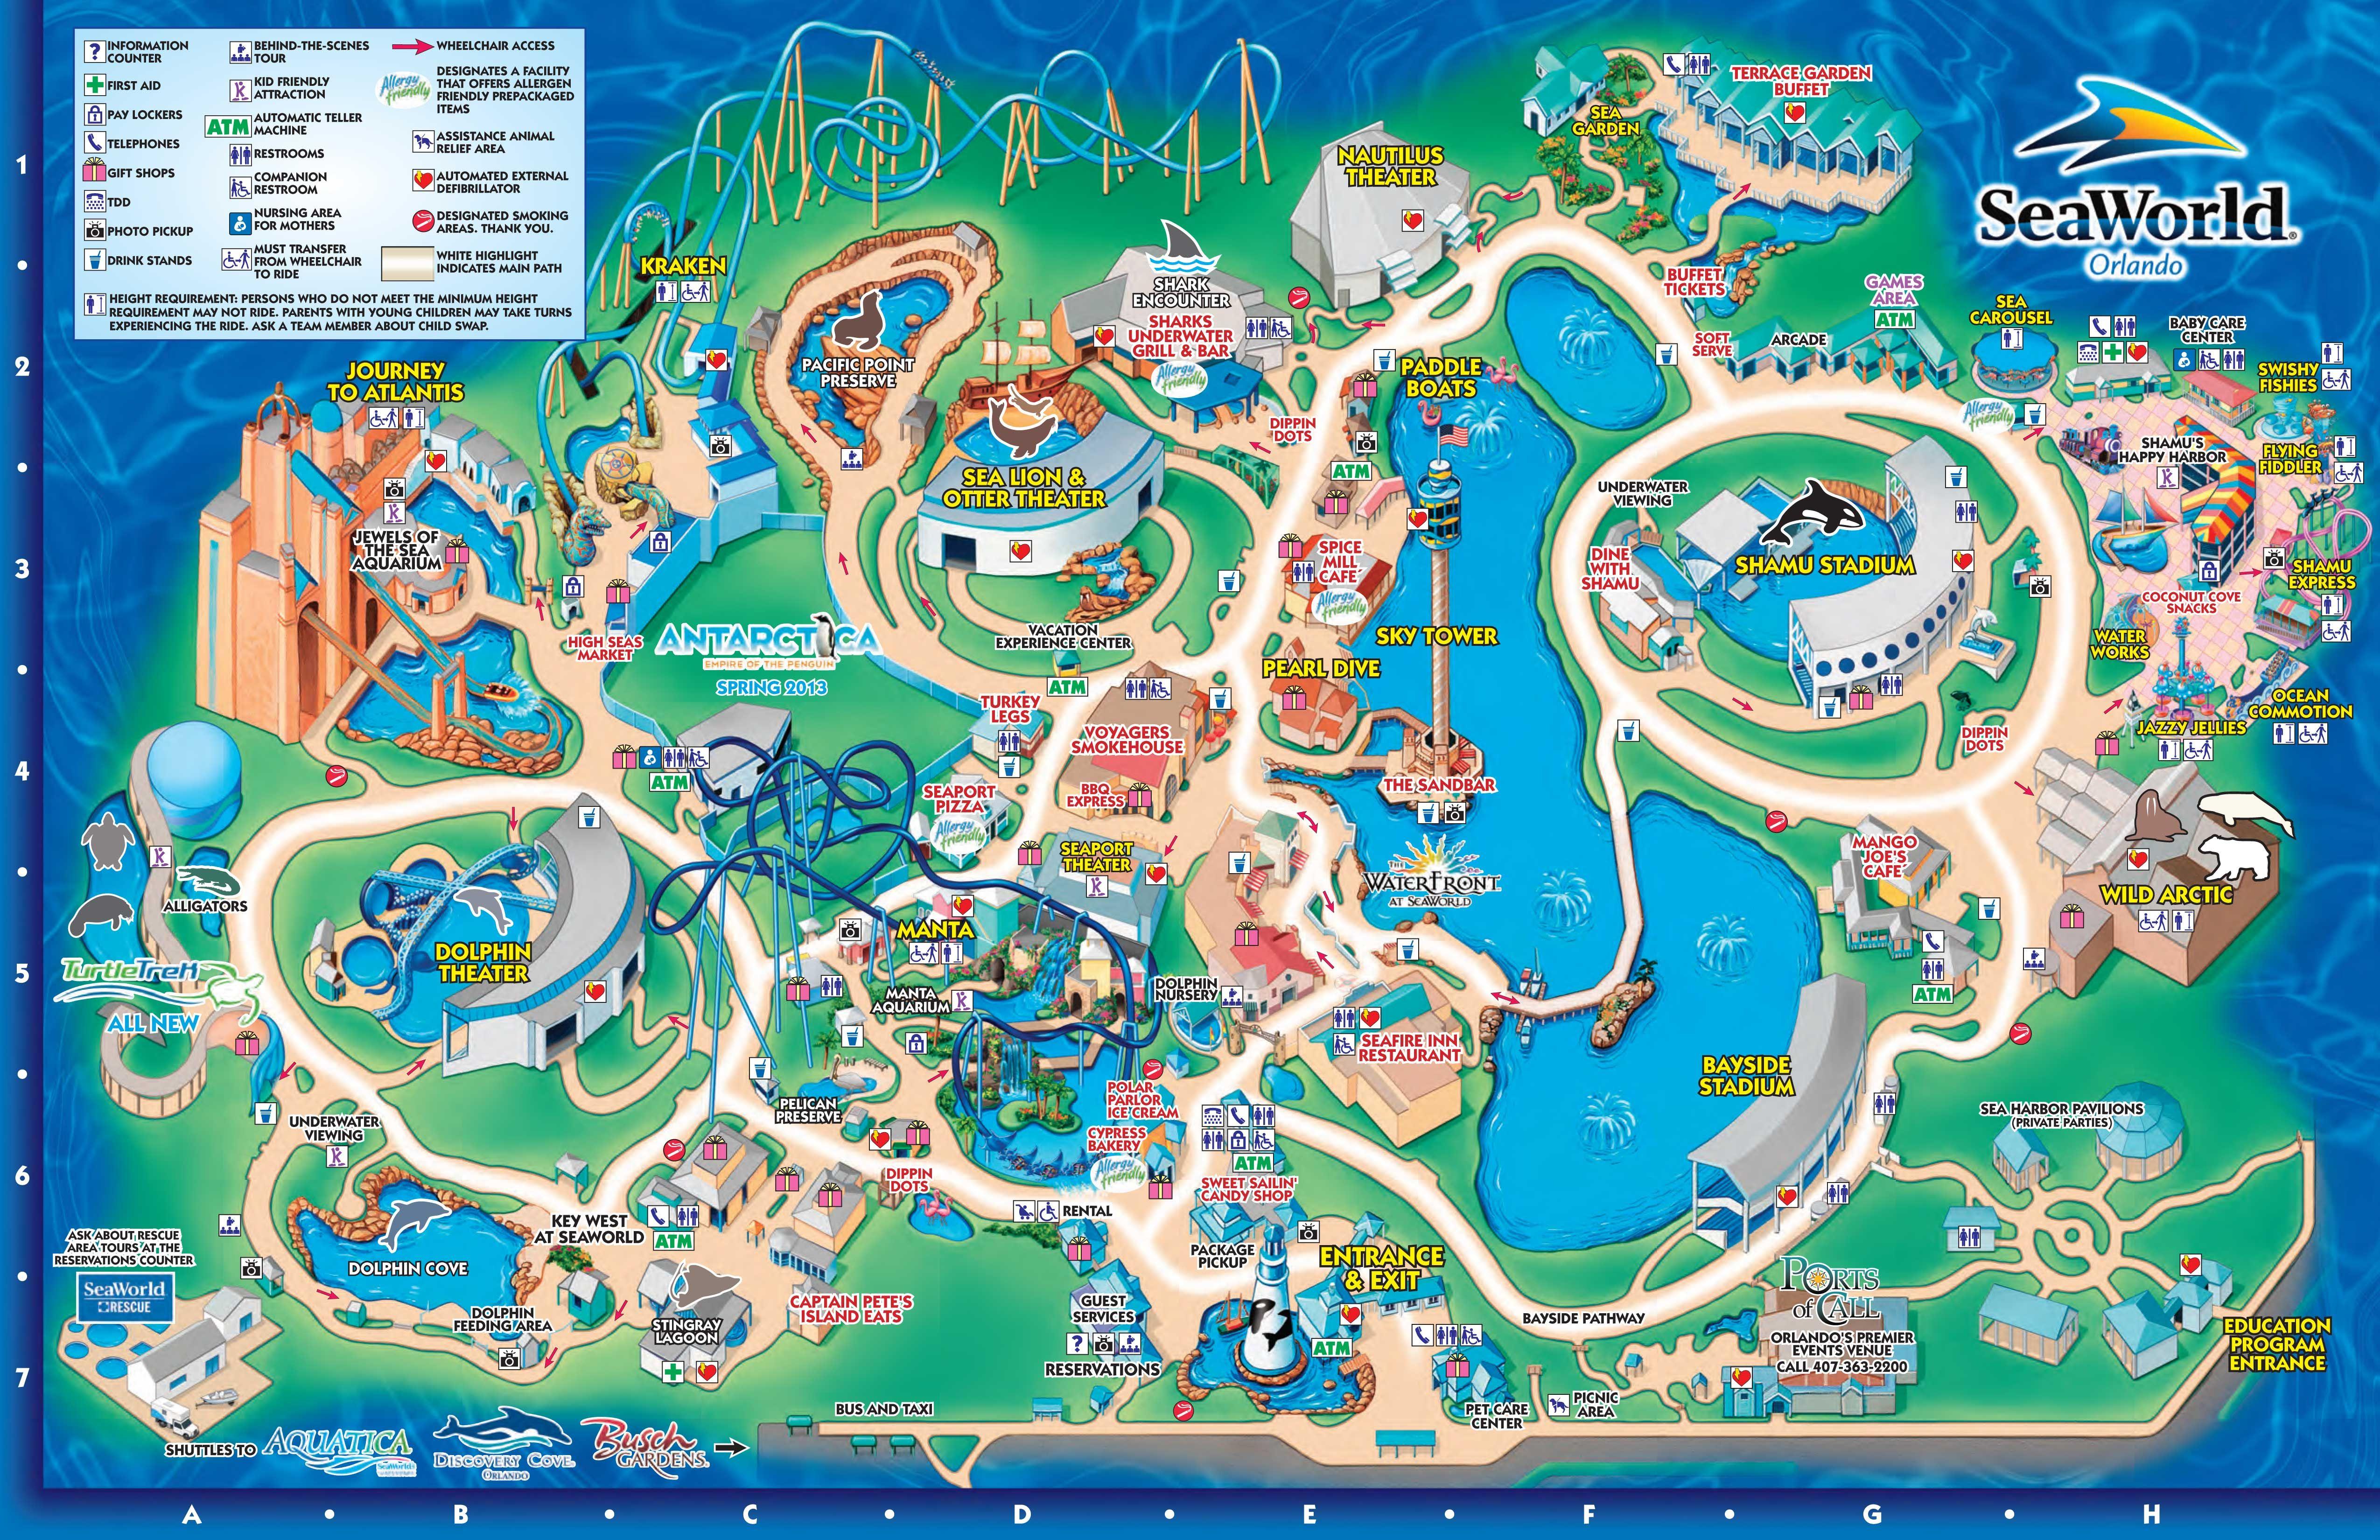 Seaworld Orlando Theme Park Map - Orlando Fl • Mappery   Aquariums - Seaworld Orlando Map 2018 Printable